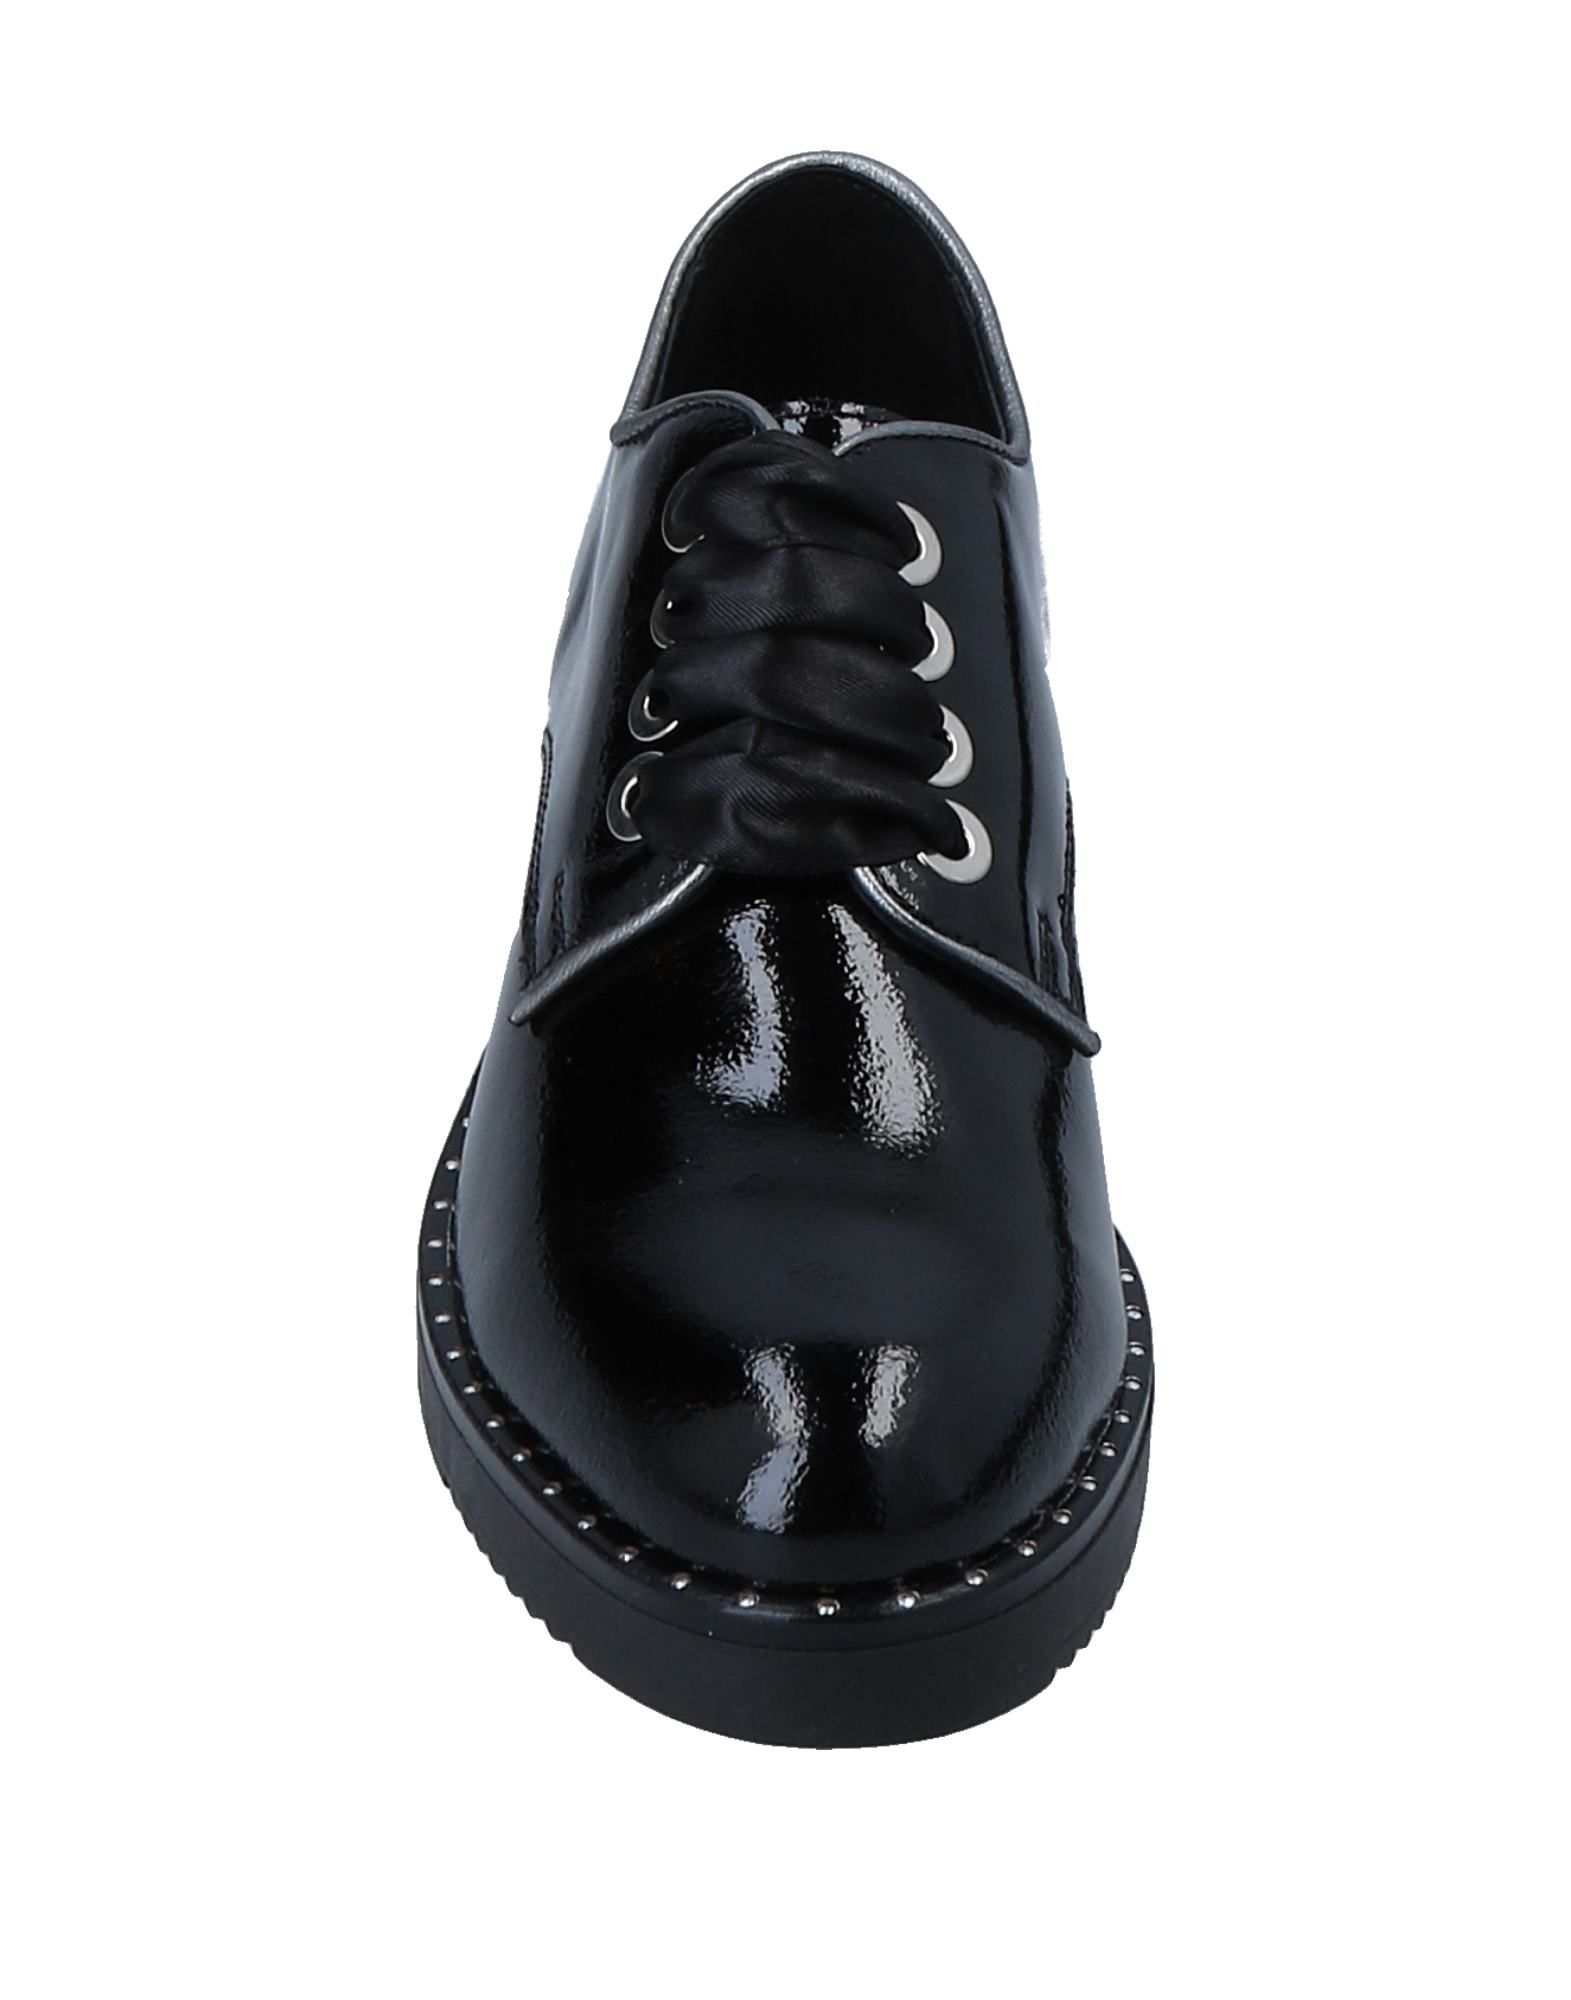 Gut um Dardozzi billige Schuhe zu tragenManuela Dardozzi um Schnürschuhe Damen  11558314JU 15aaac